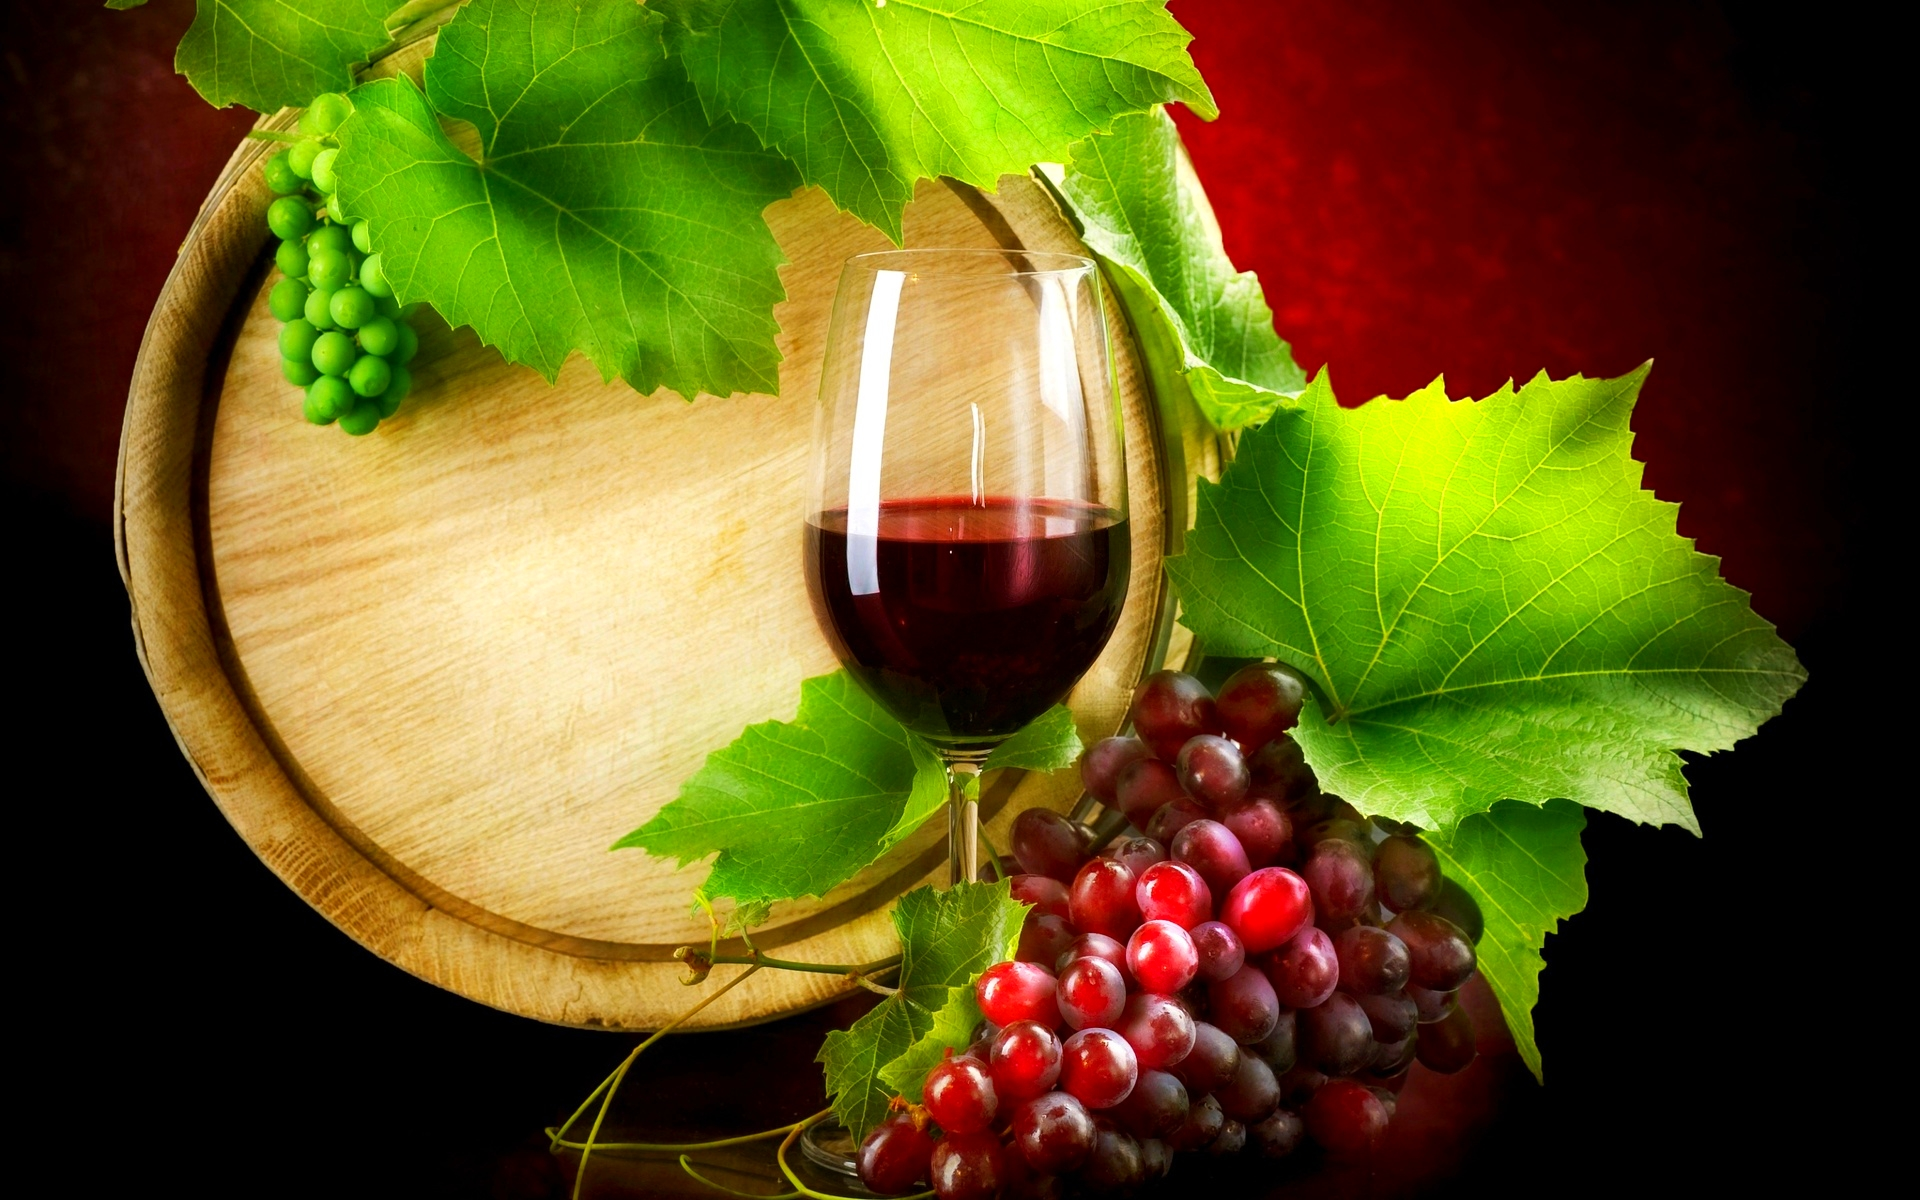 вино бочка, виноград, стакан, рюмка вина, вино красное